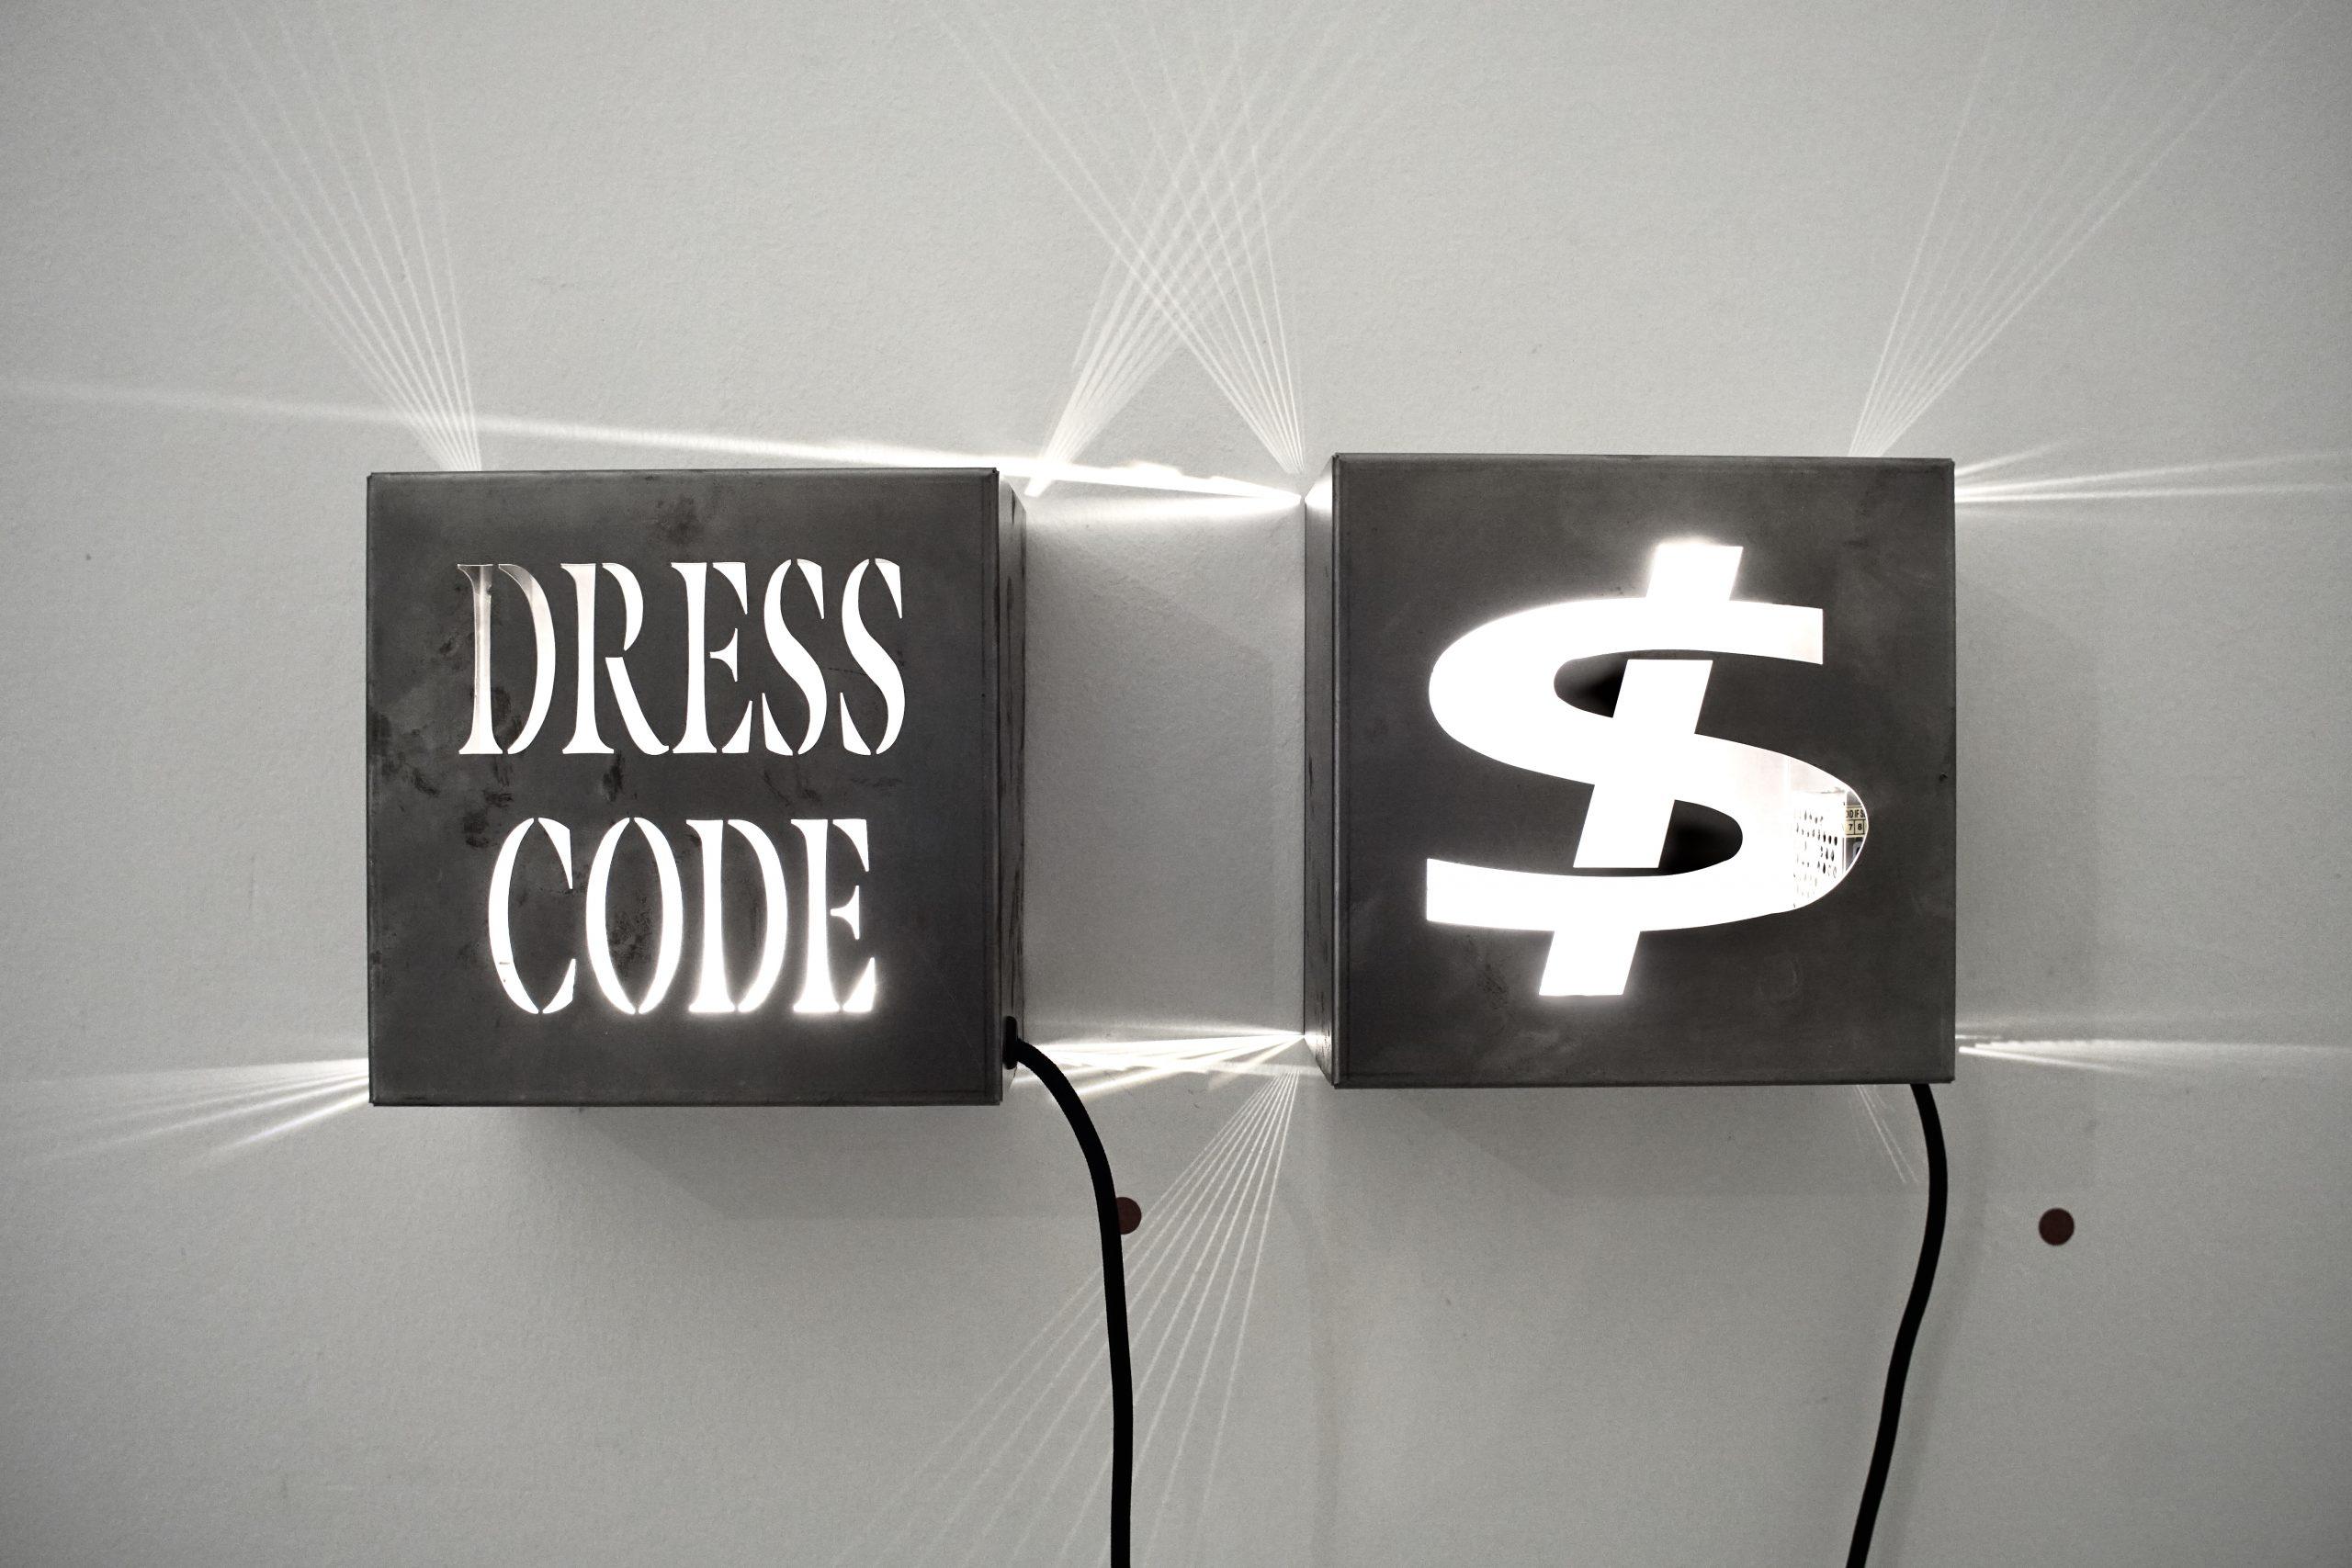 "<img src=""Marco-Piantoni-dress-code-1-scaled.jpg"" alt=""parole ufficio""/>"